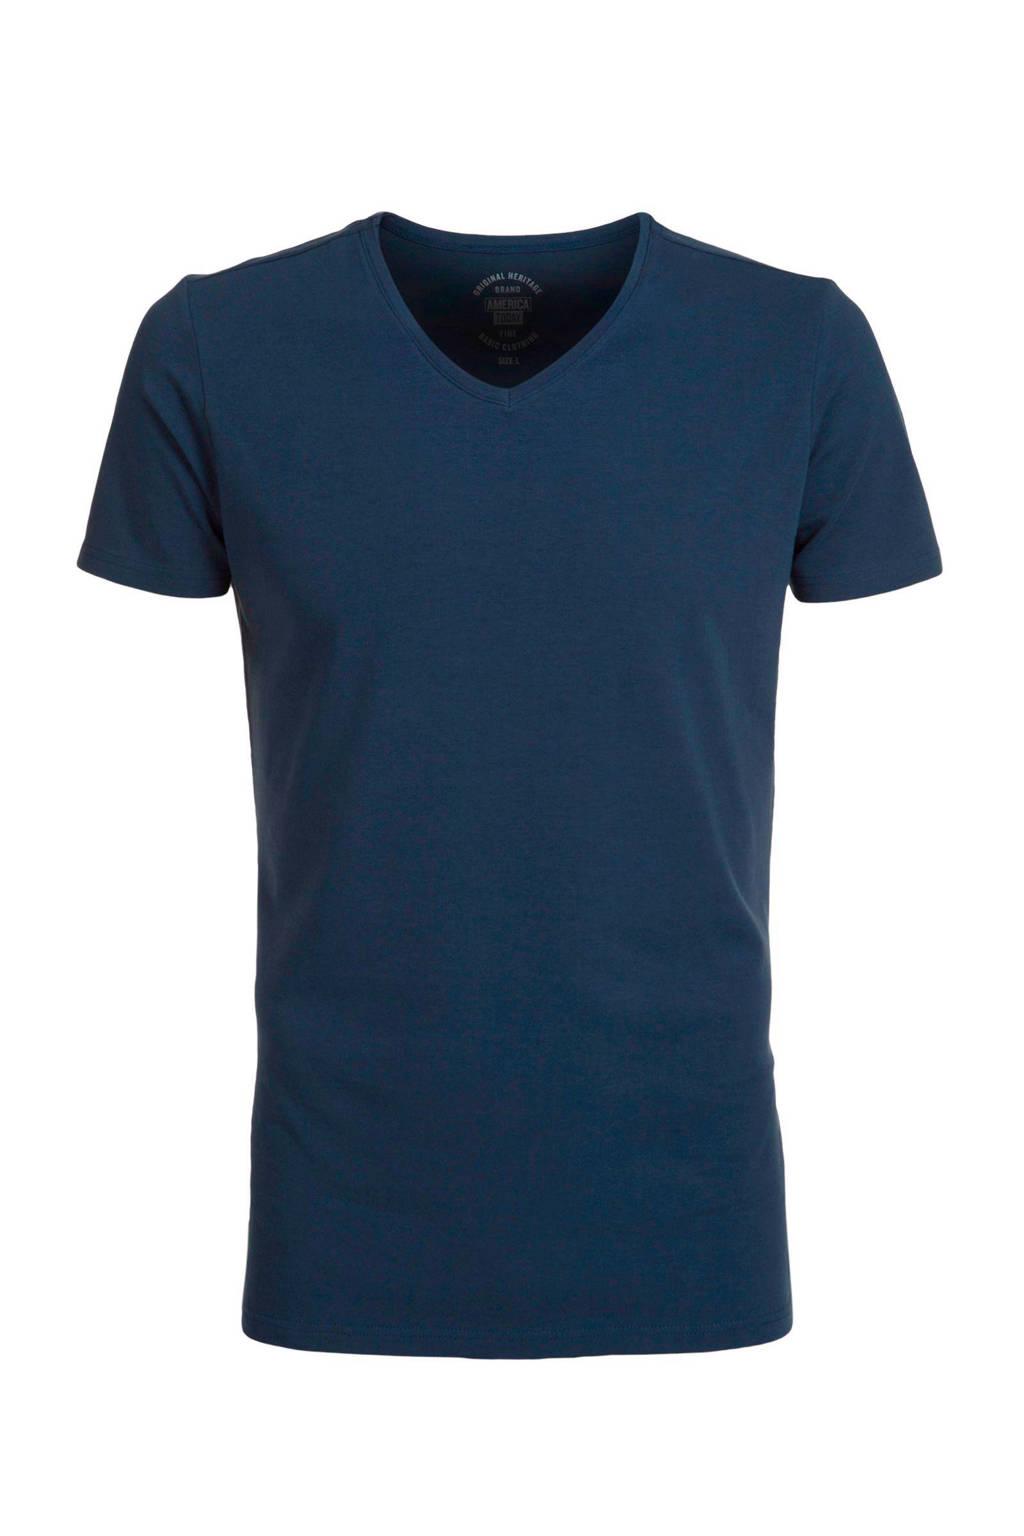 America Today regular fit T-shirt, Donkerblauw